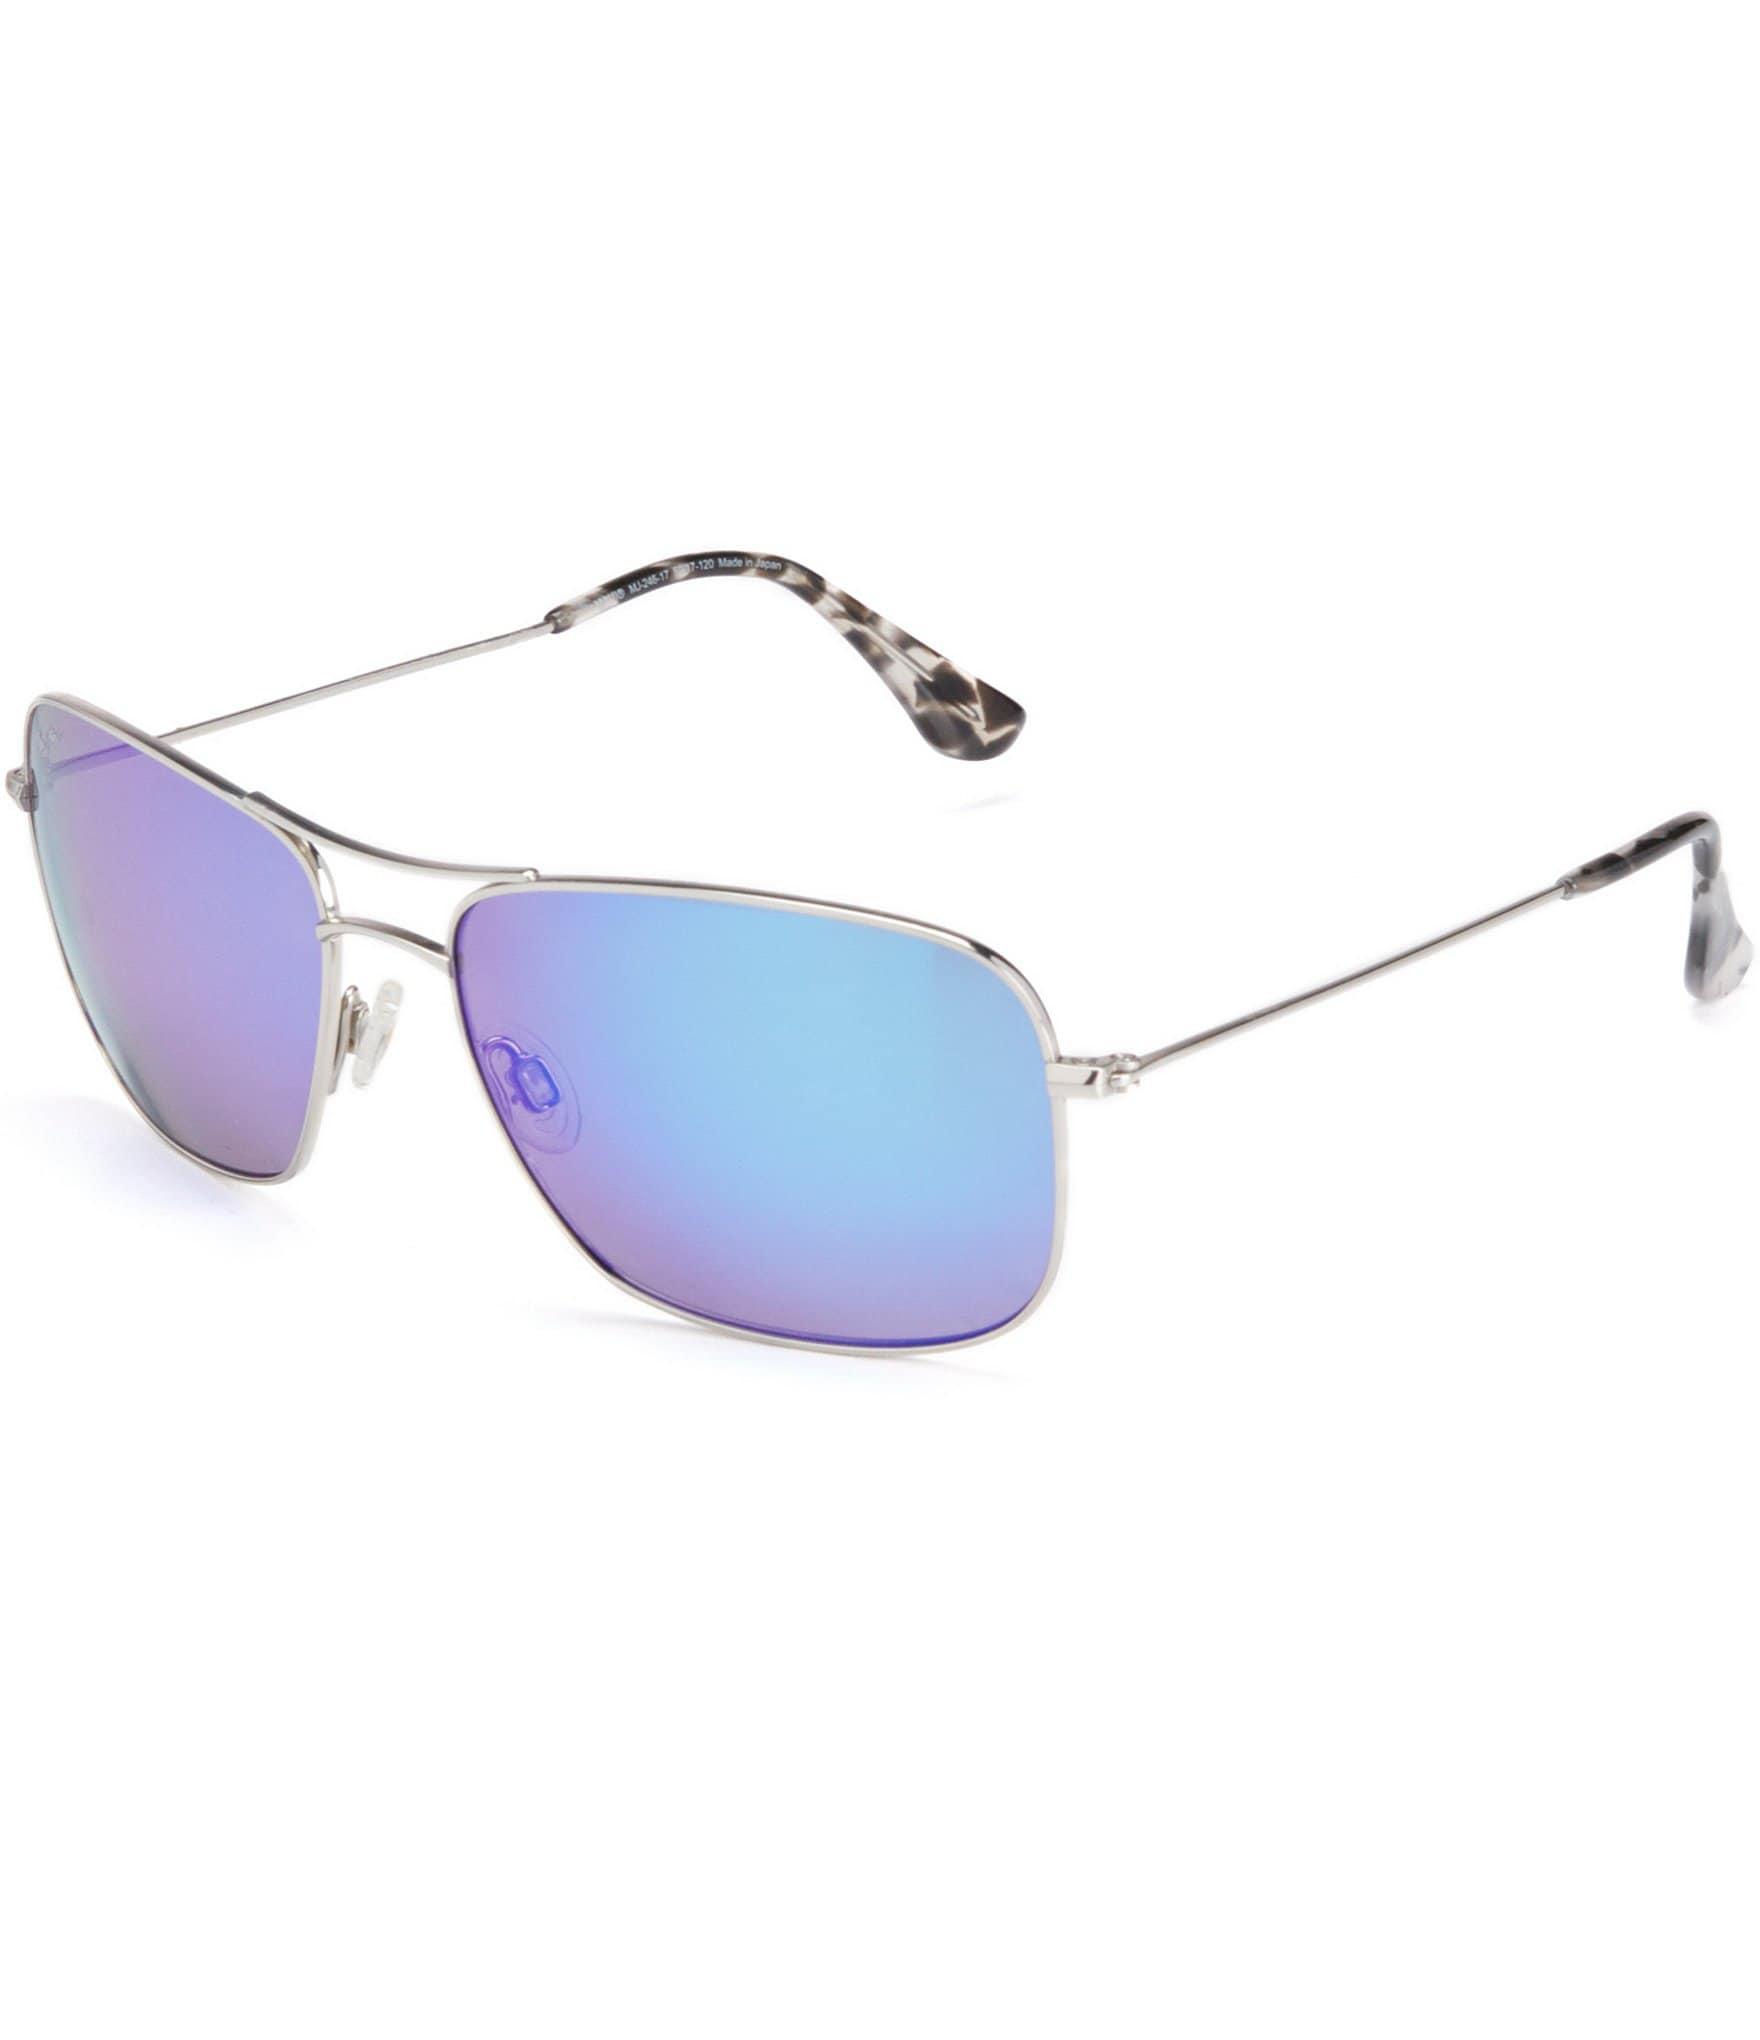 f3d3ace87592 Maui Jim Women's Square Sunglasses   Dillard's